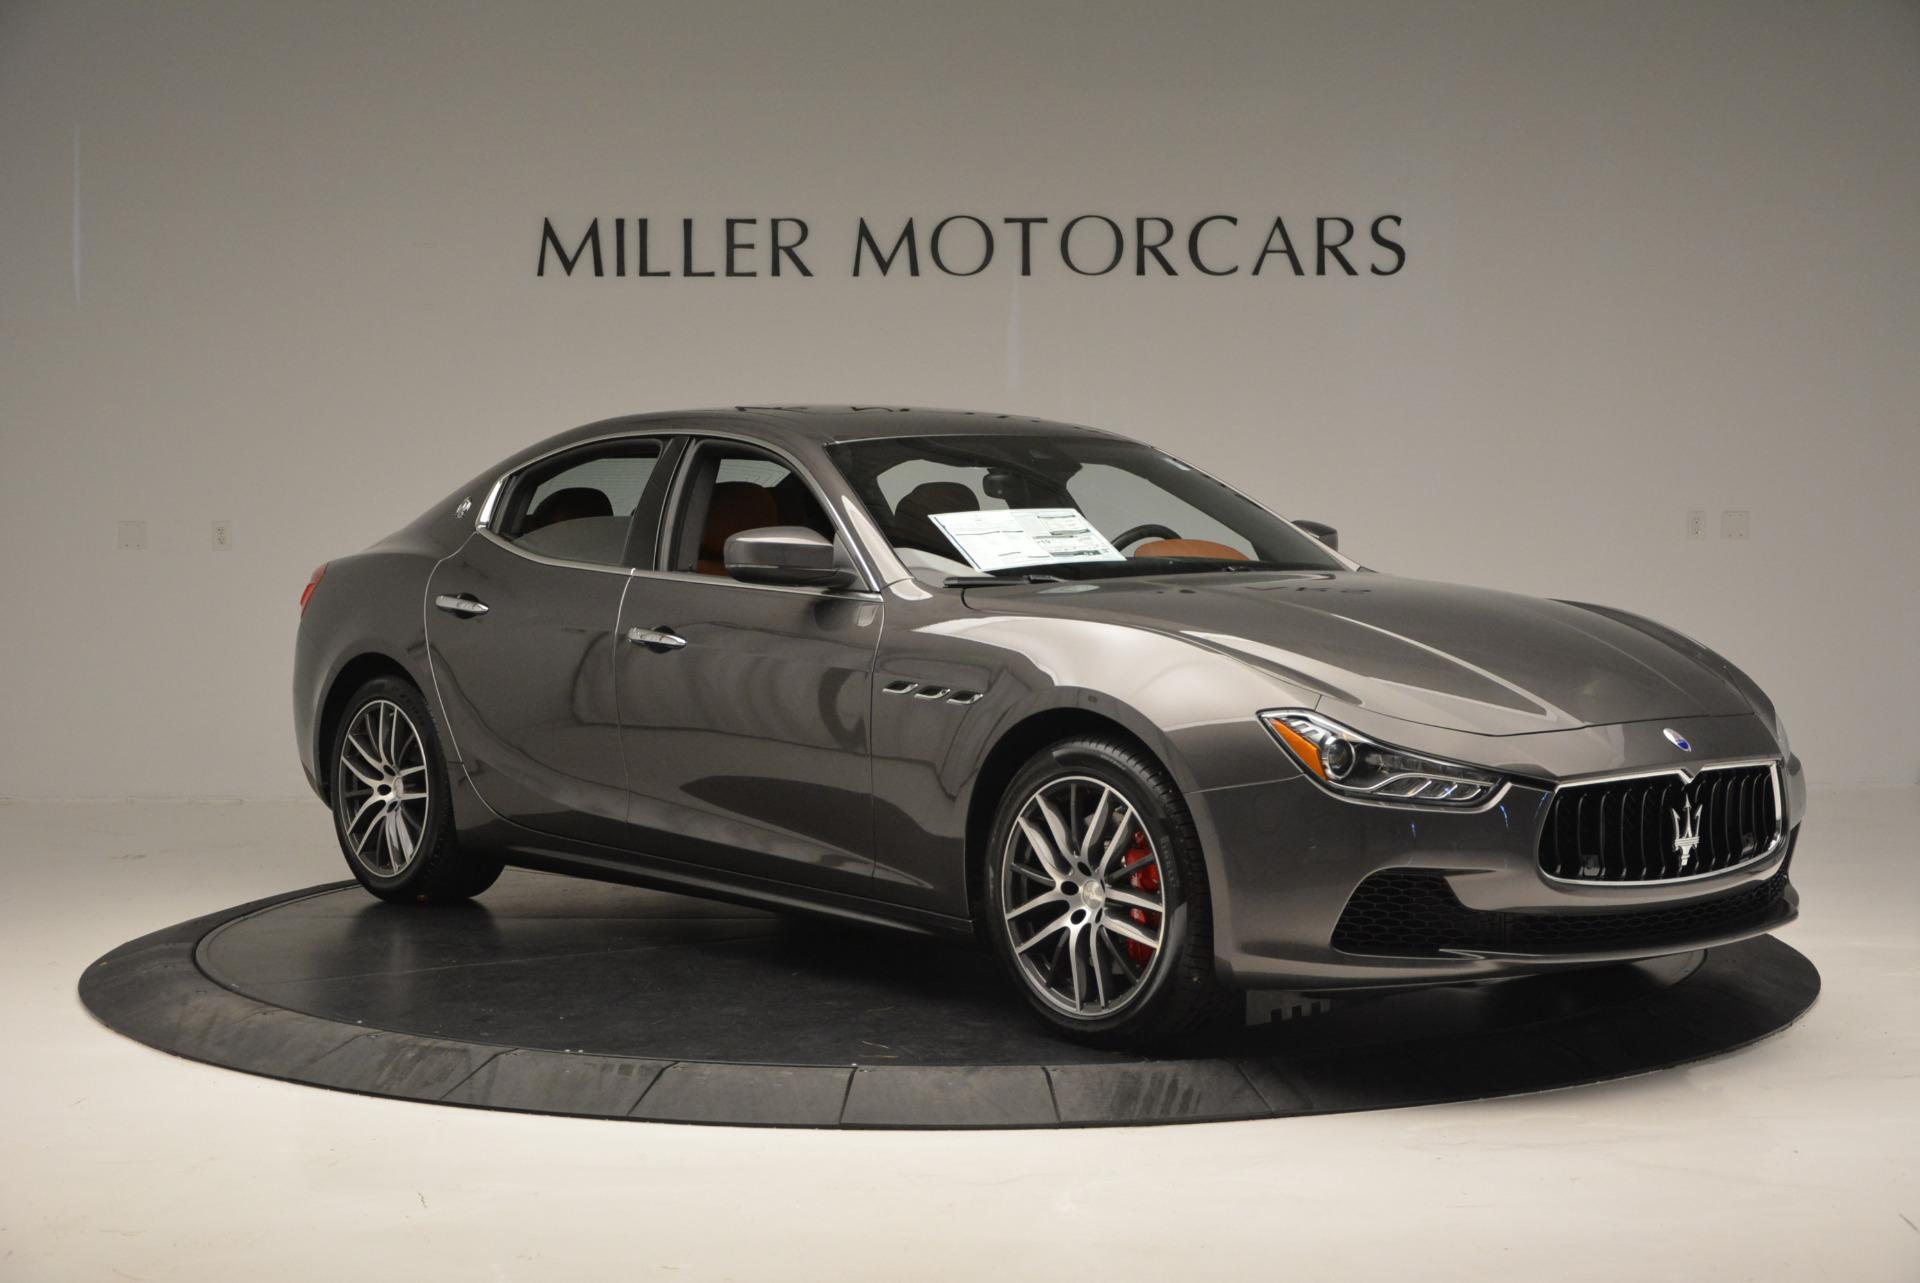 Used 2017 Maserati Ghibli S Q4  EX-LOANER For Sale In Greenwich, CT. Alfa Romeo of Greenwich, W311 565_p11